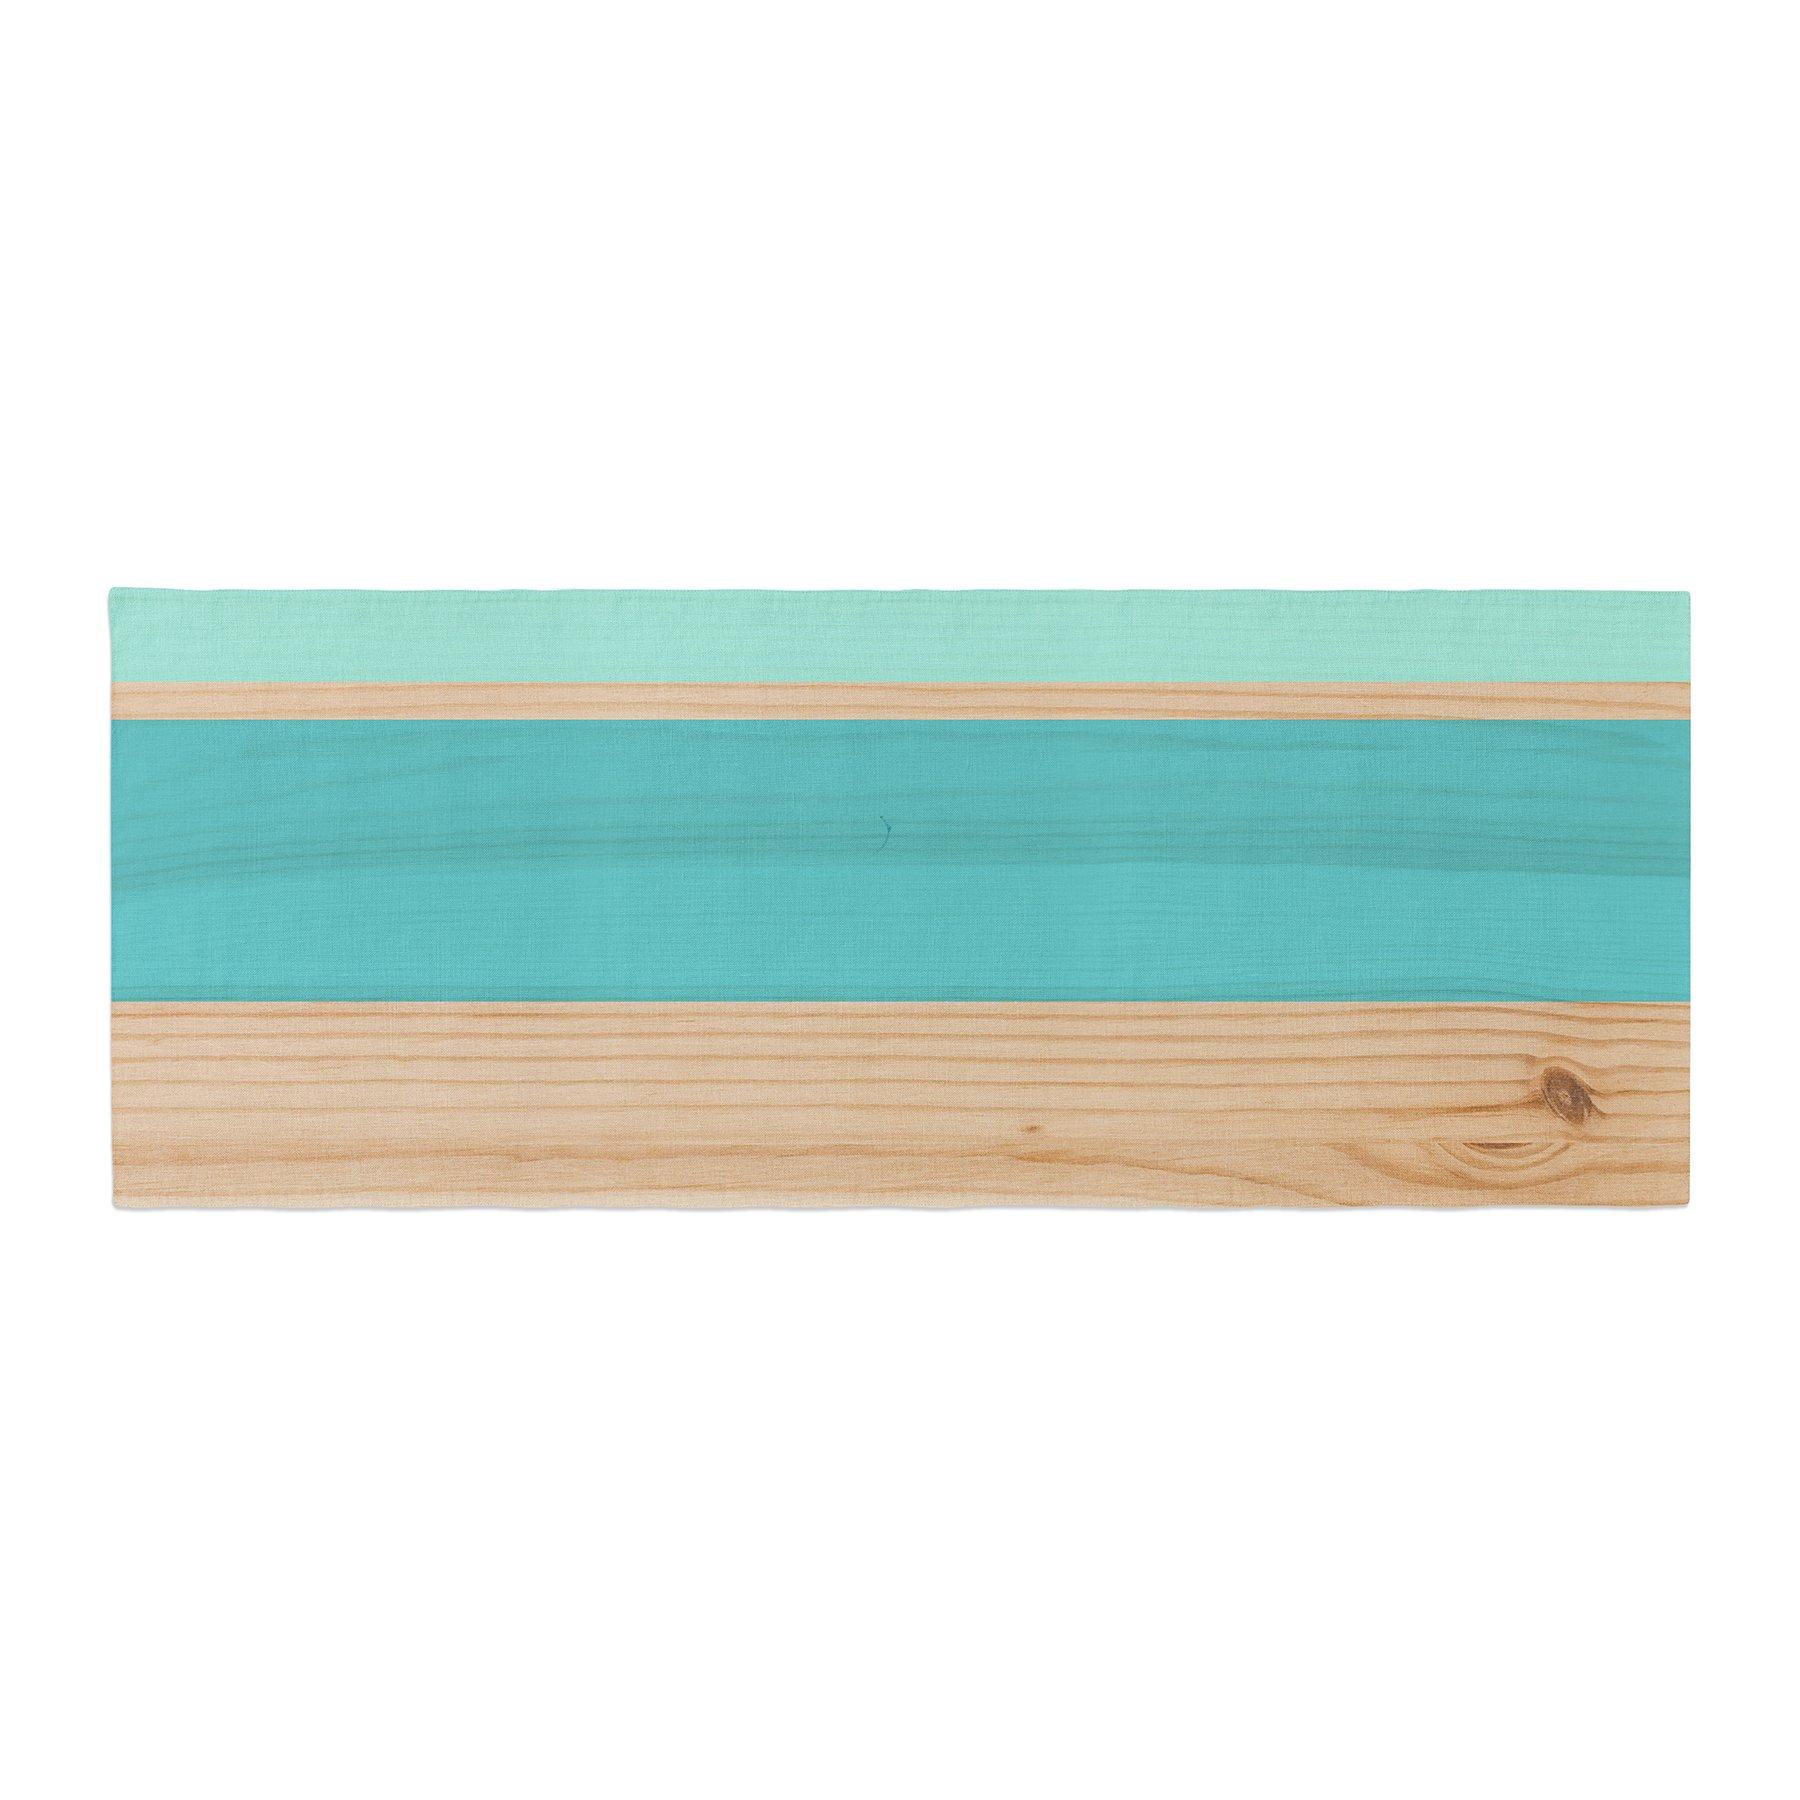 Kess InHouse KESS Original Spring Swatch - Blue Green Teal Wood Bed Runner, 34'' x 86''